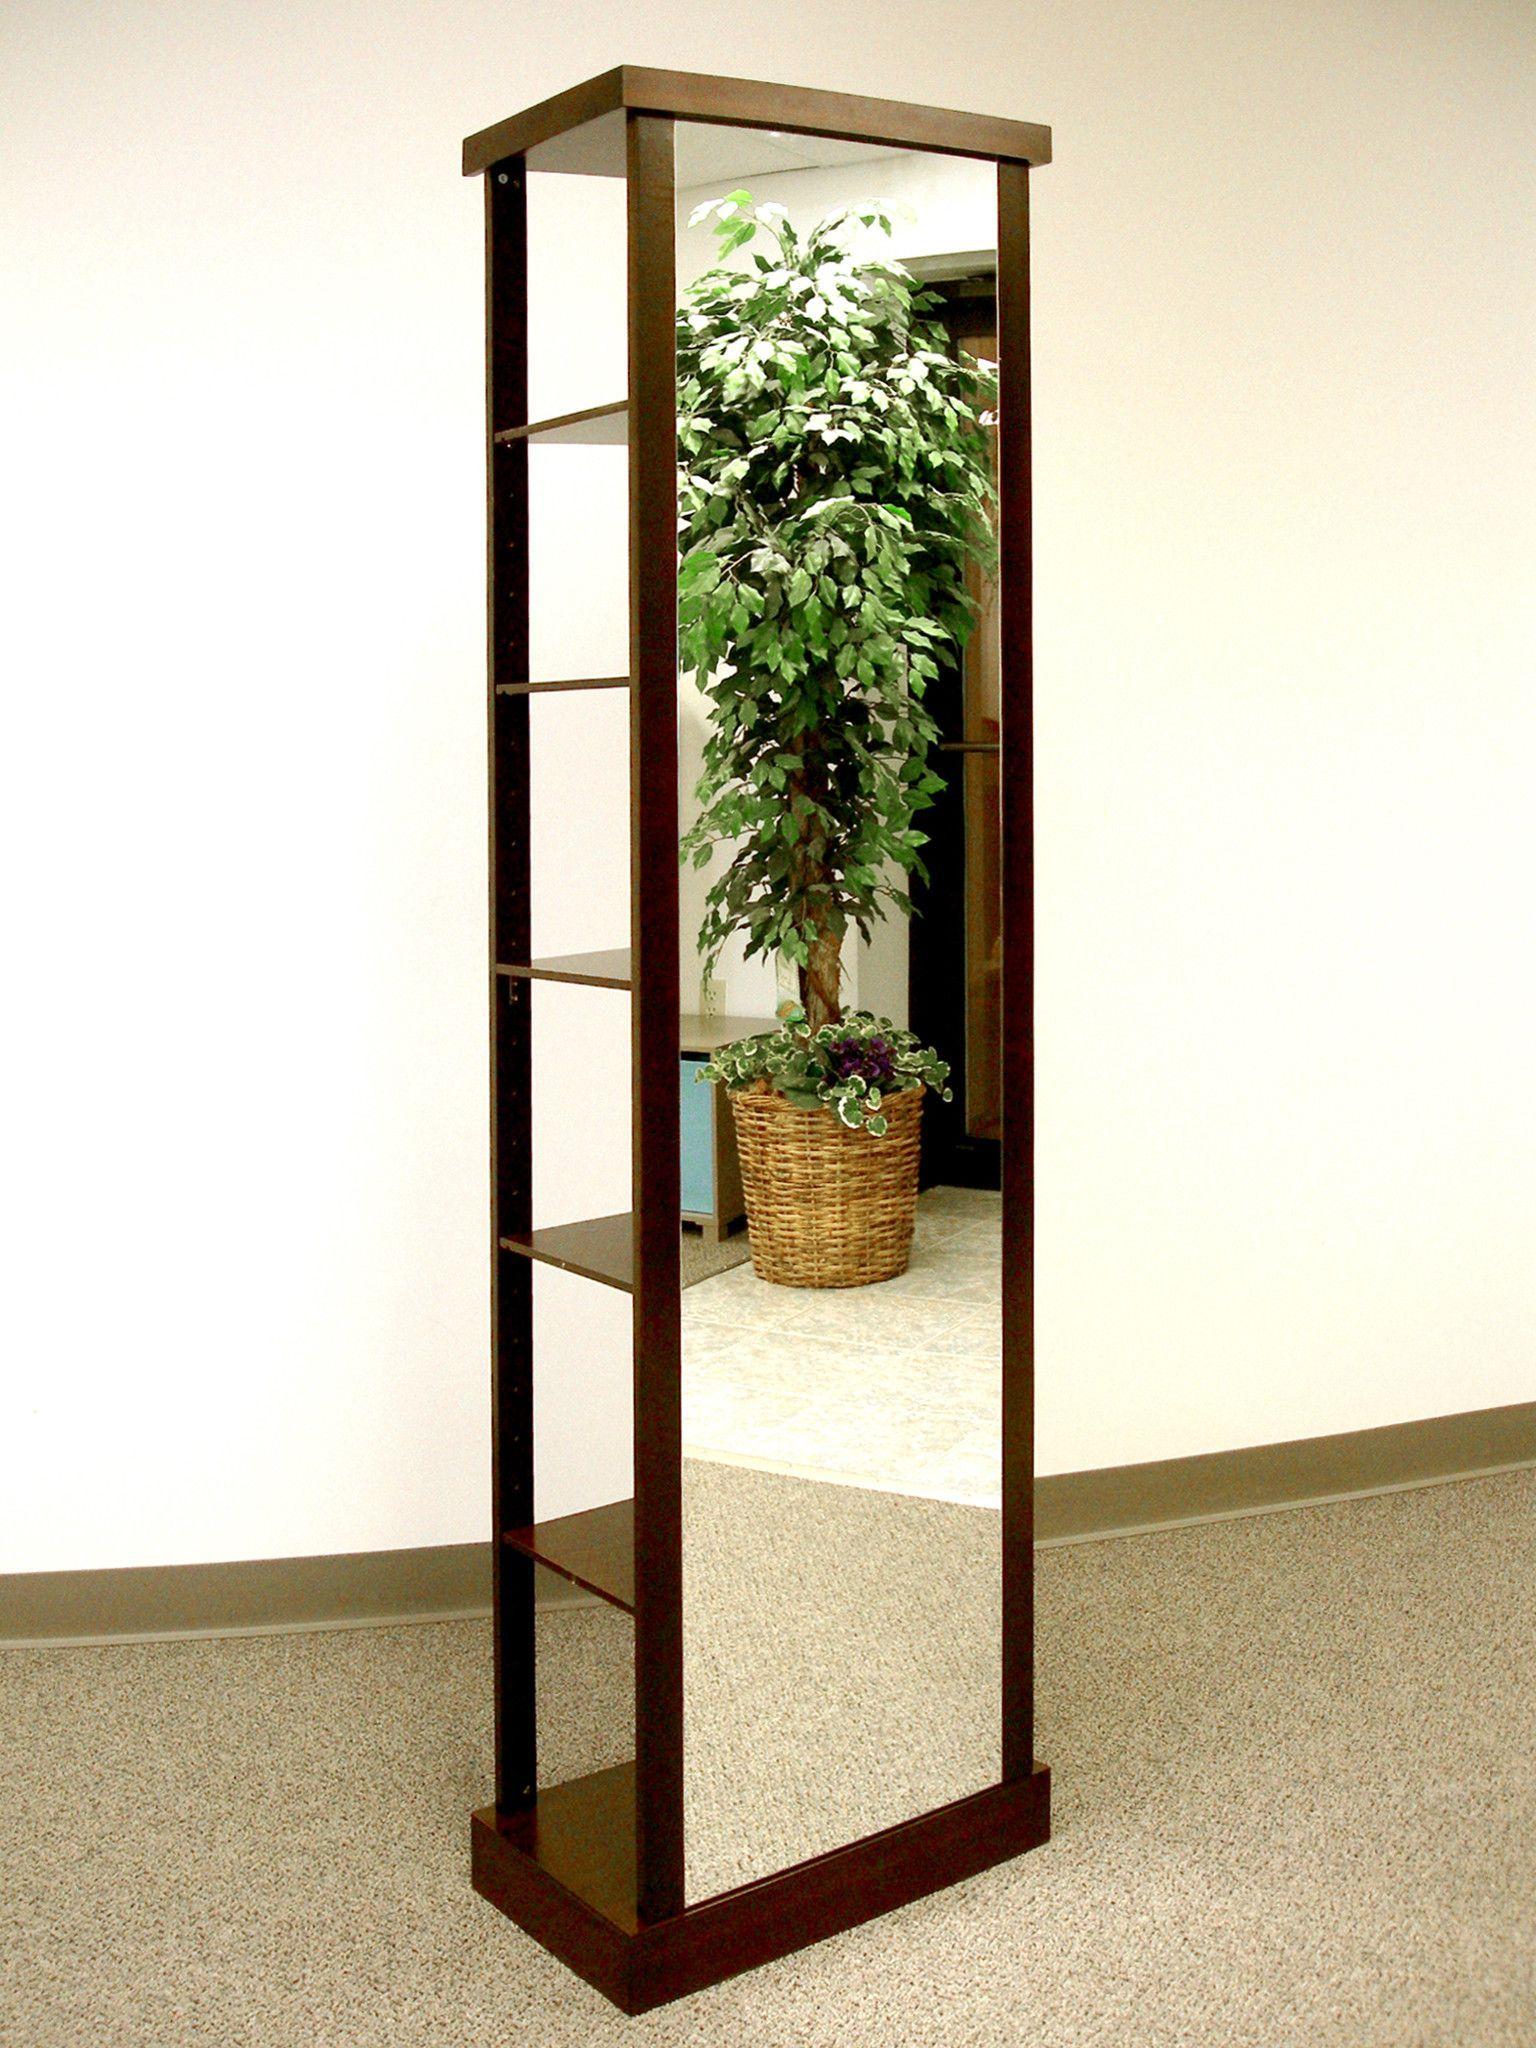 Floor mirror Standing mirror, Full length mirror with